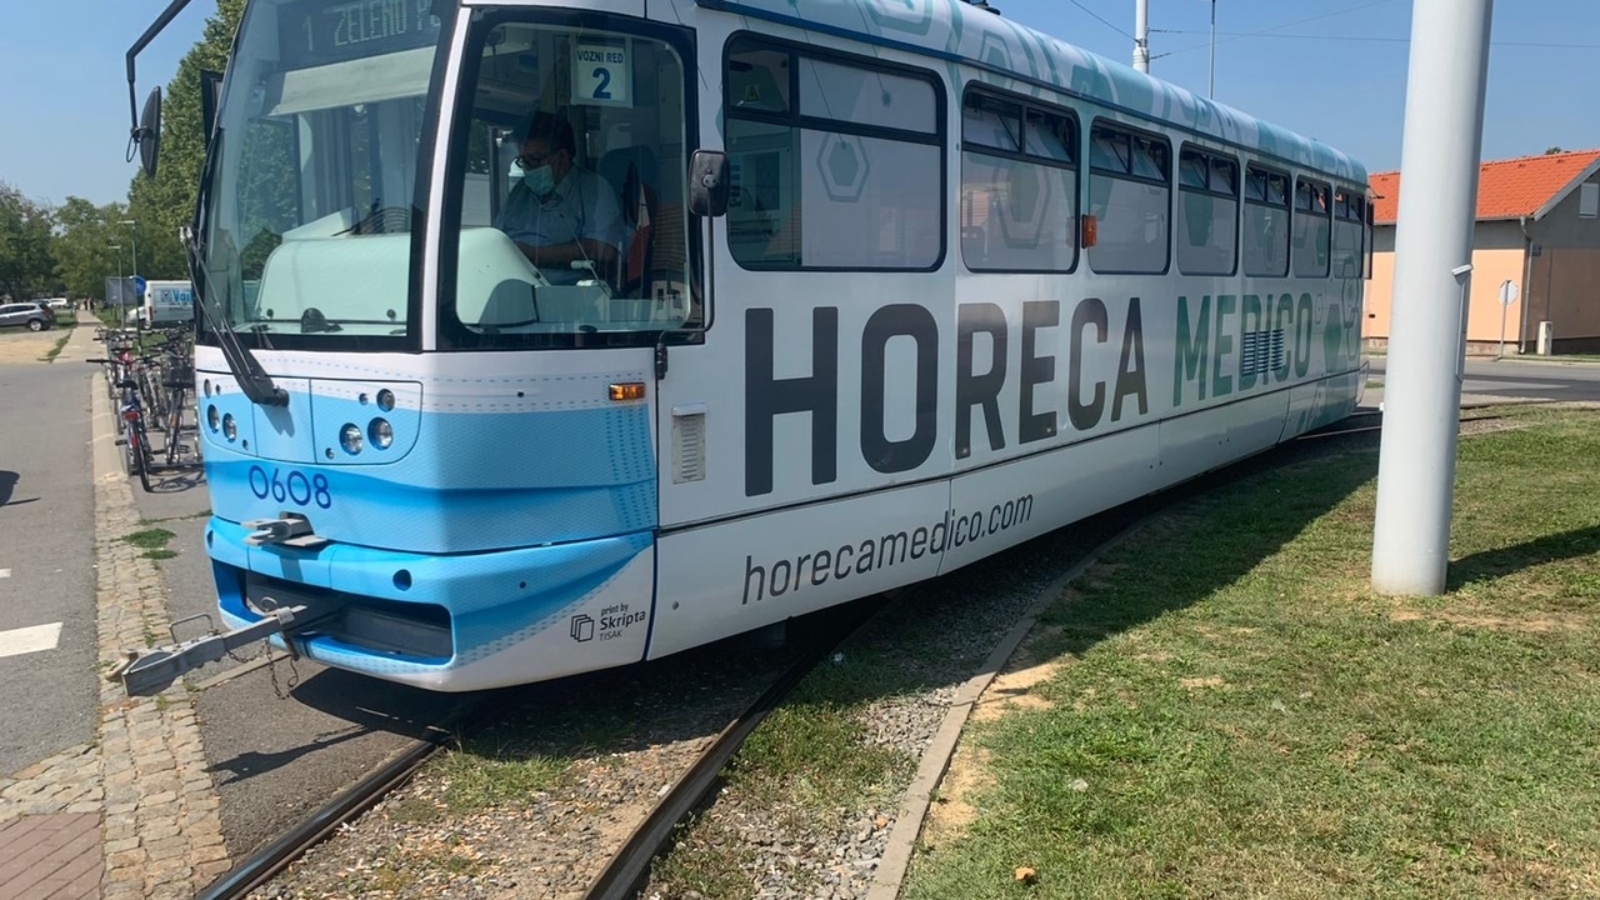 HORECA_TRAM